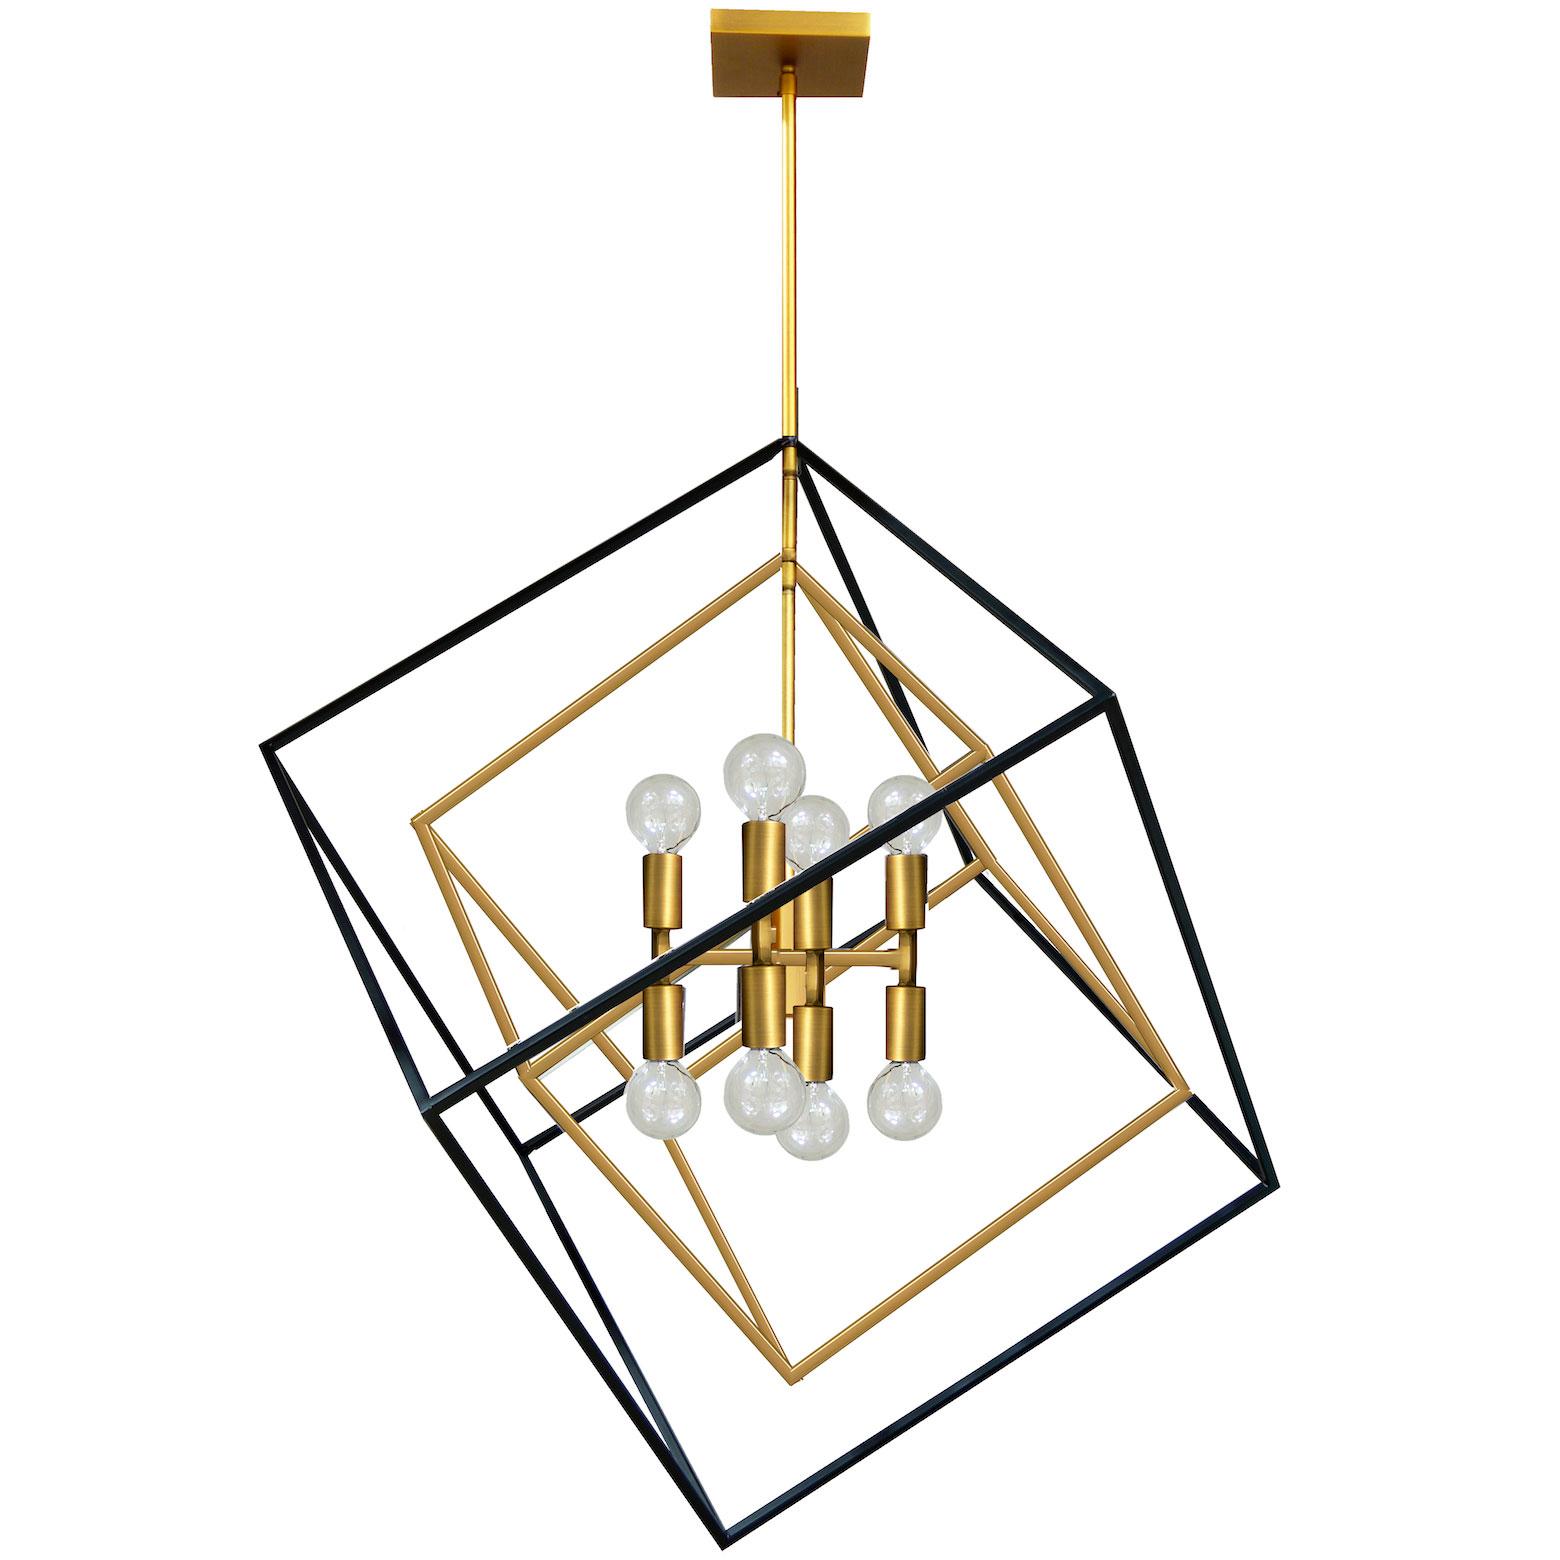 Pendant lighting kap 278p vb mb pendant lighting industrial dainolite kap 278p vb mb mozeypictures Images